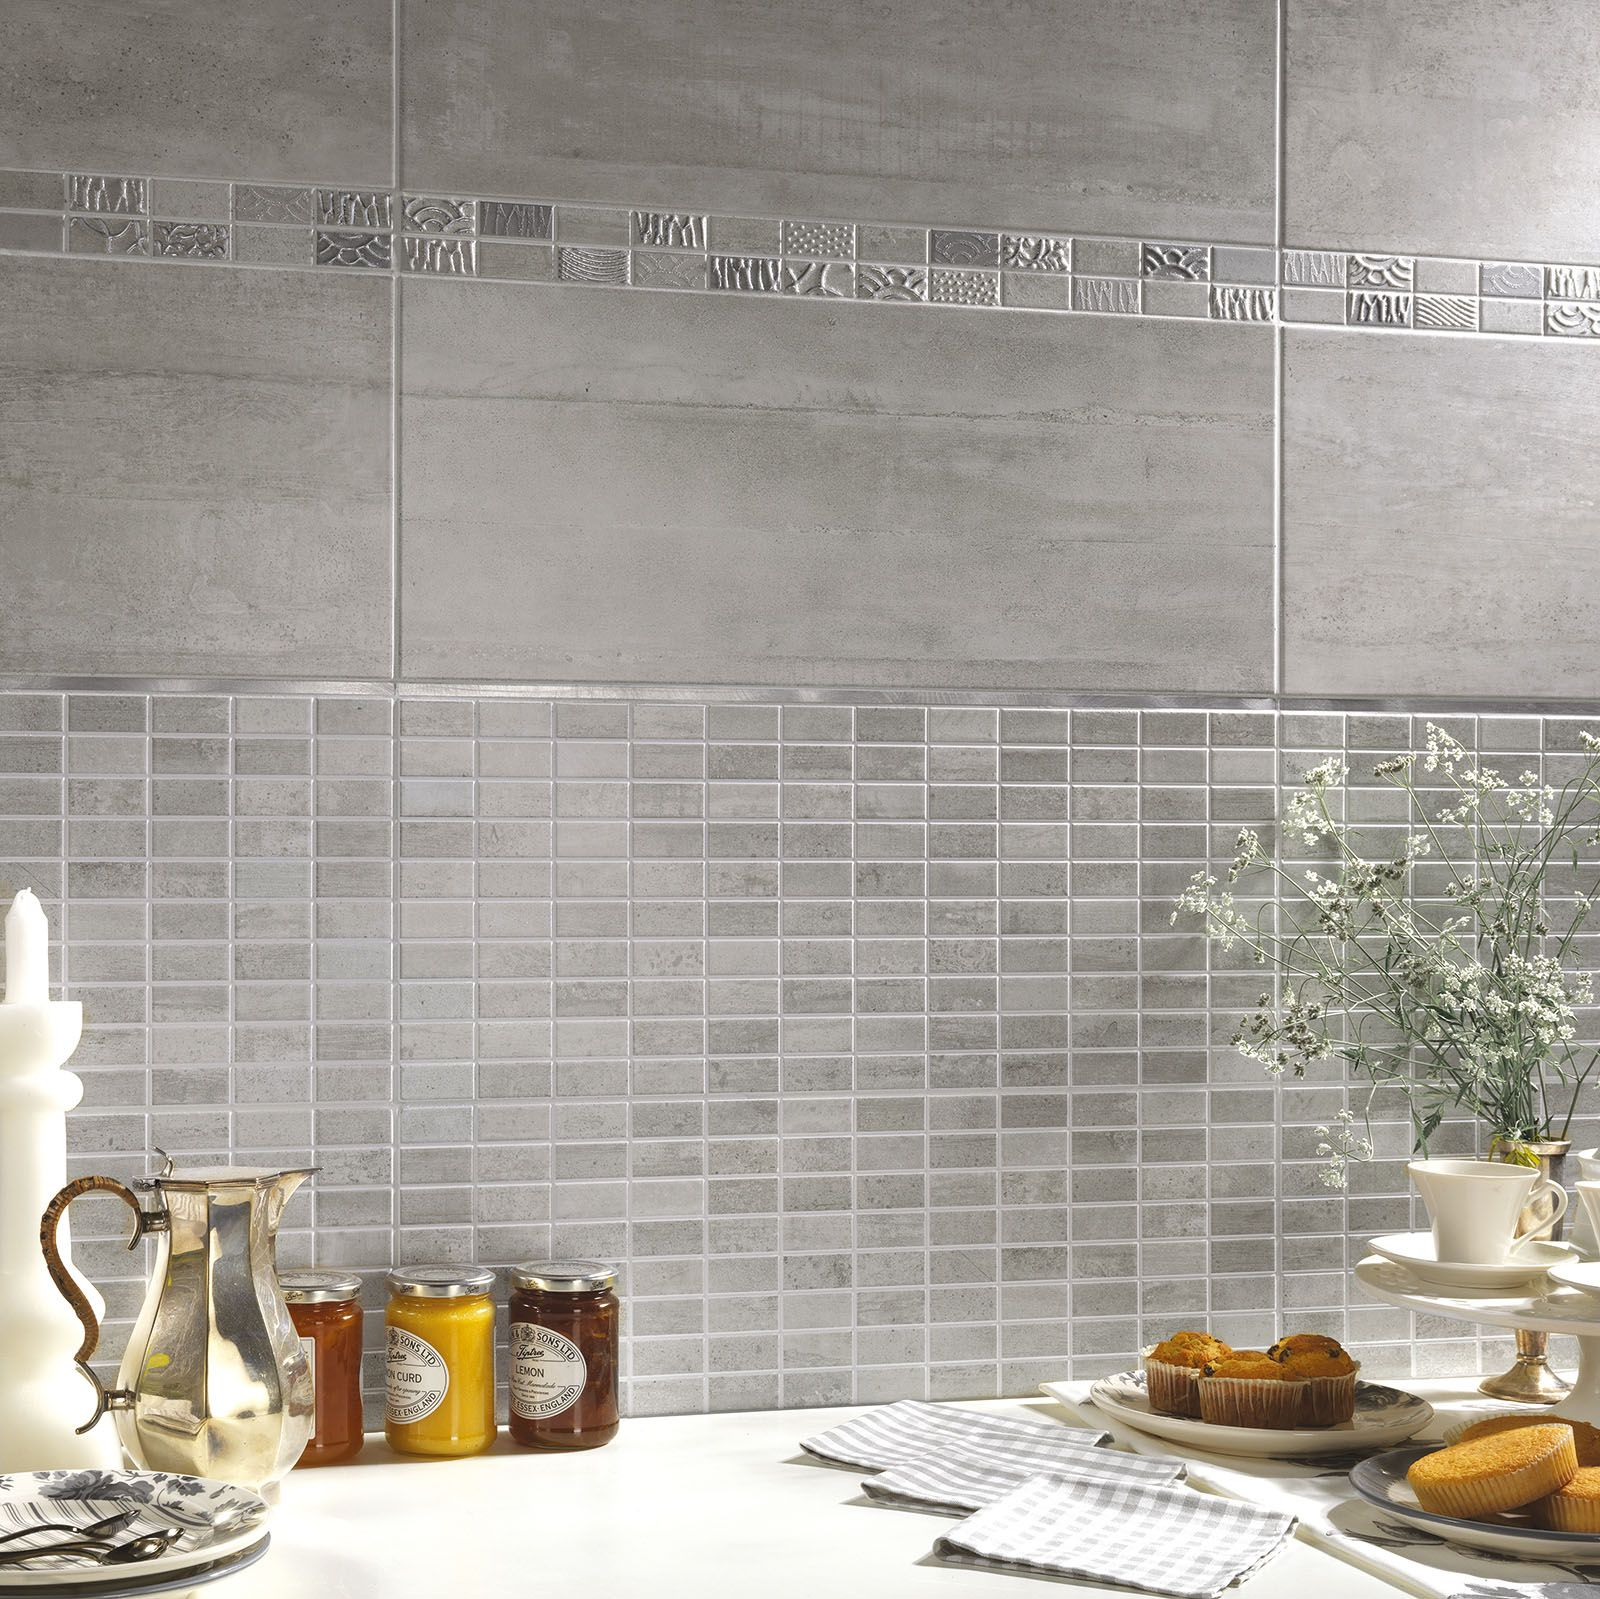 Kitchen herberia urban walltile grey 25x60 mix mosaic grey and listel aluminium cucina - Mosaico rivestimento cucina ...